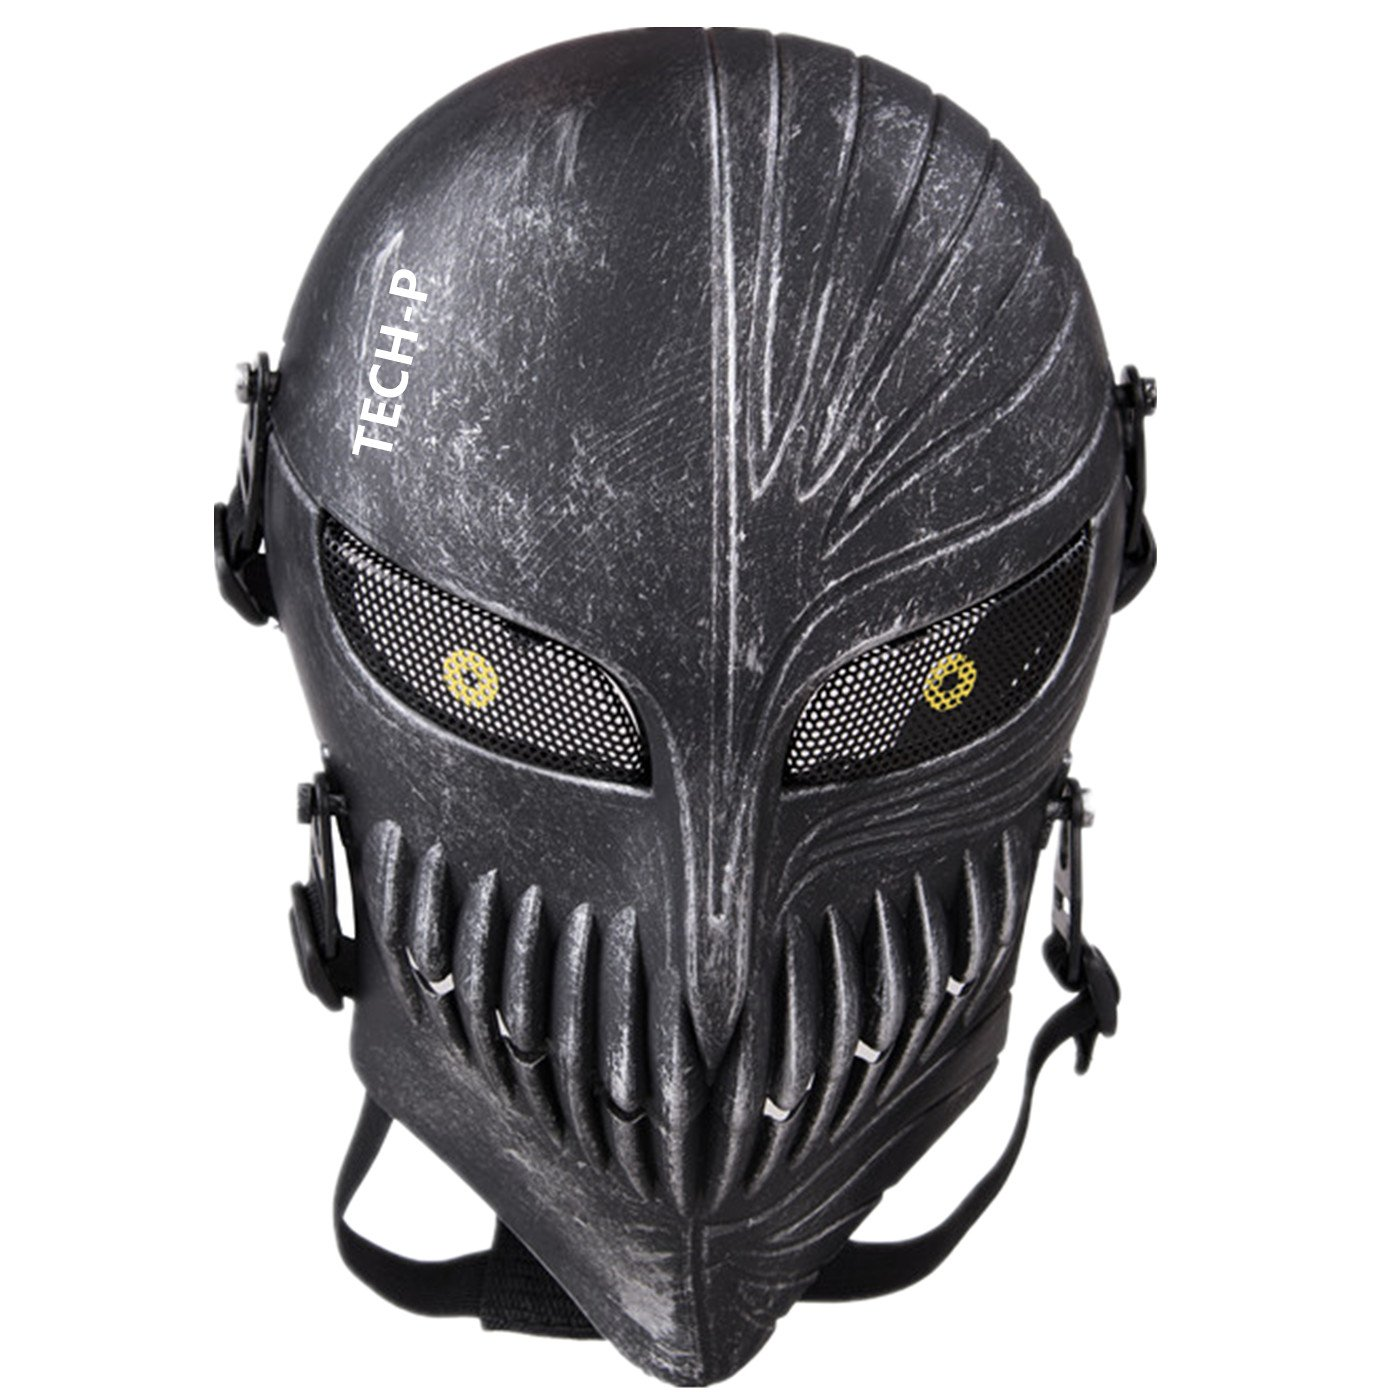 Amazon.com : Tech-p Death Skull Face Mask - Protective Mask Gear ...